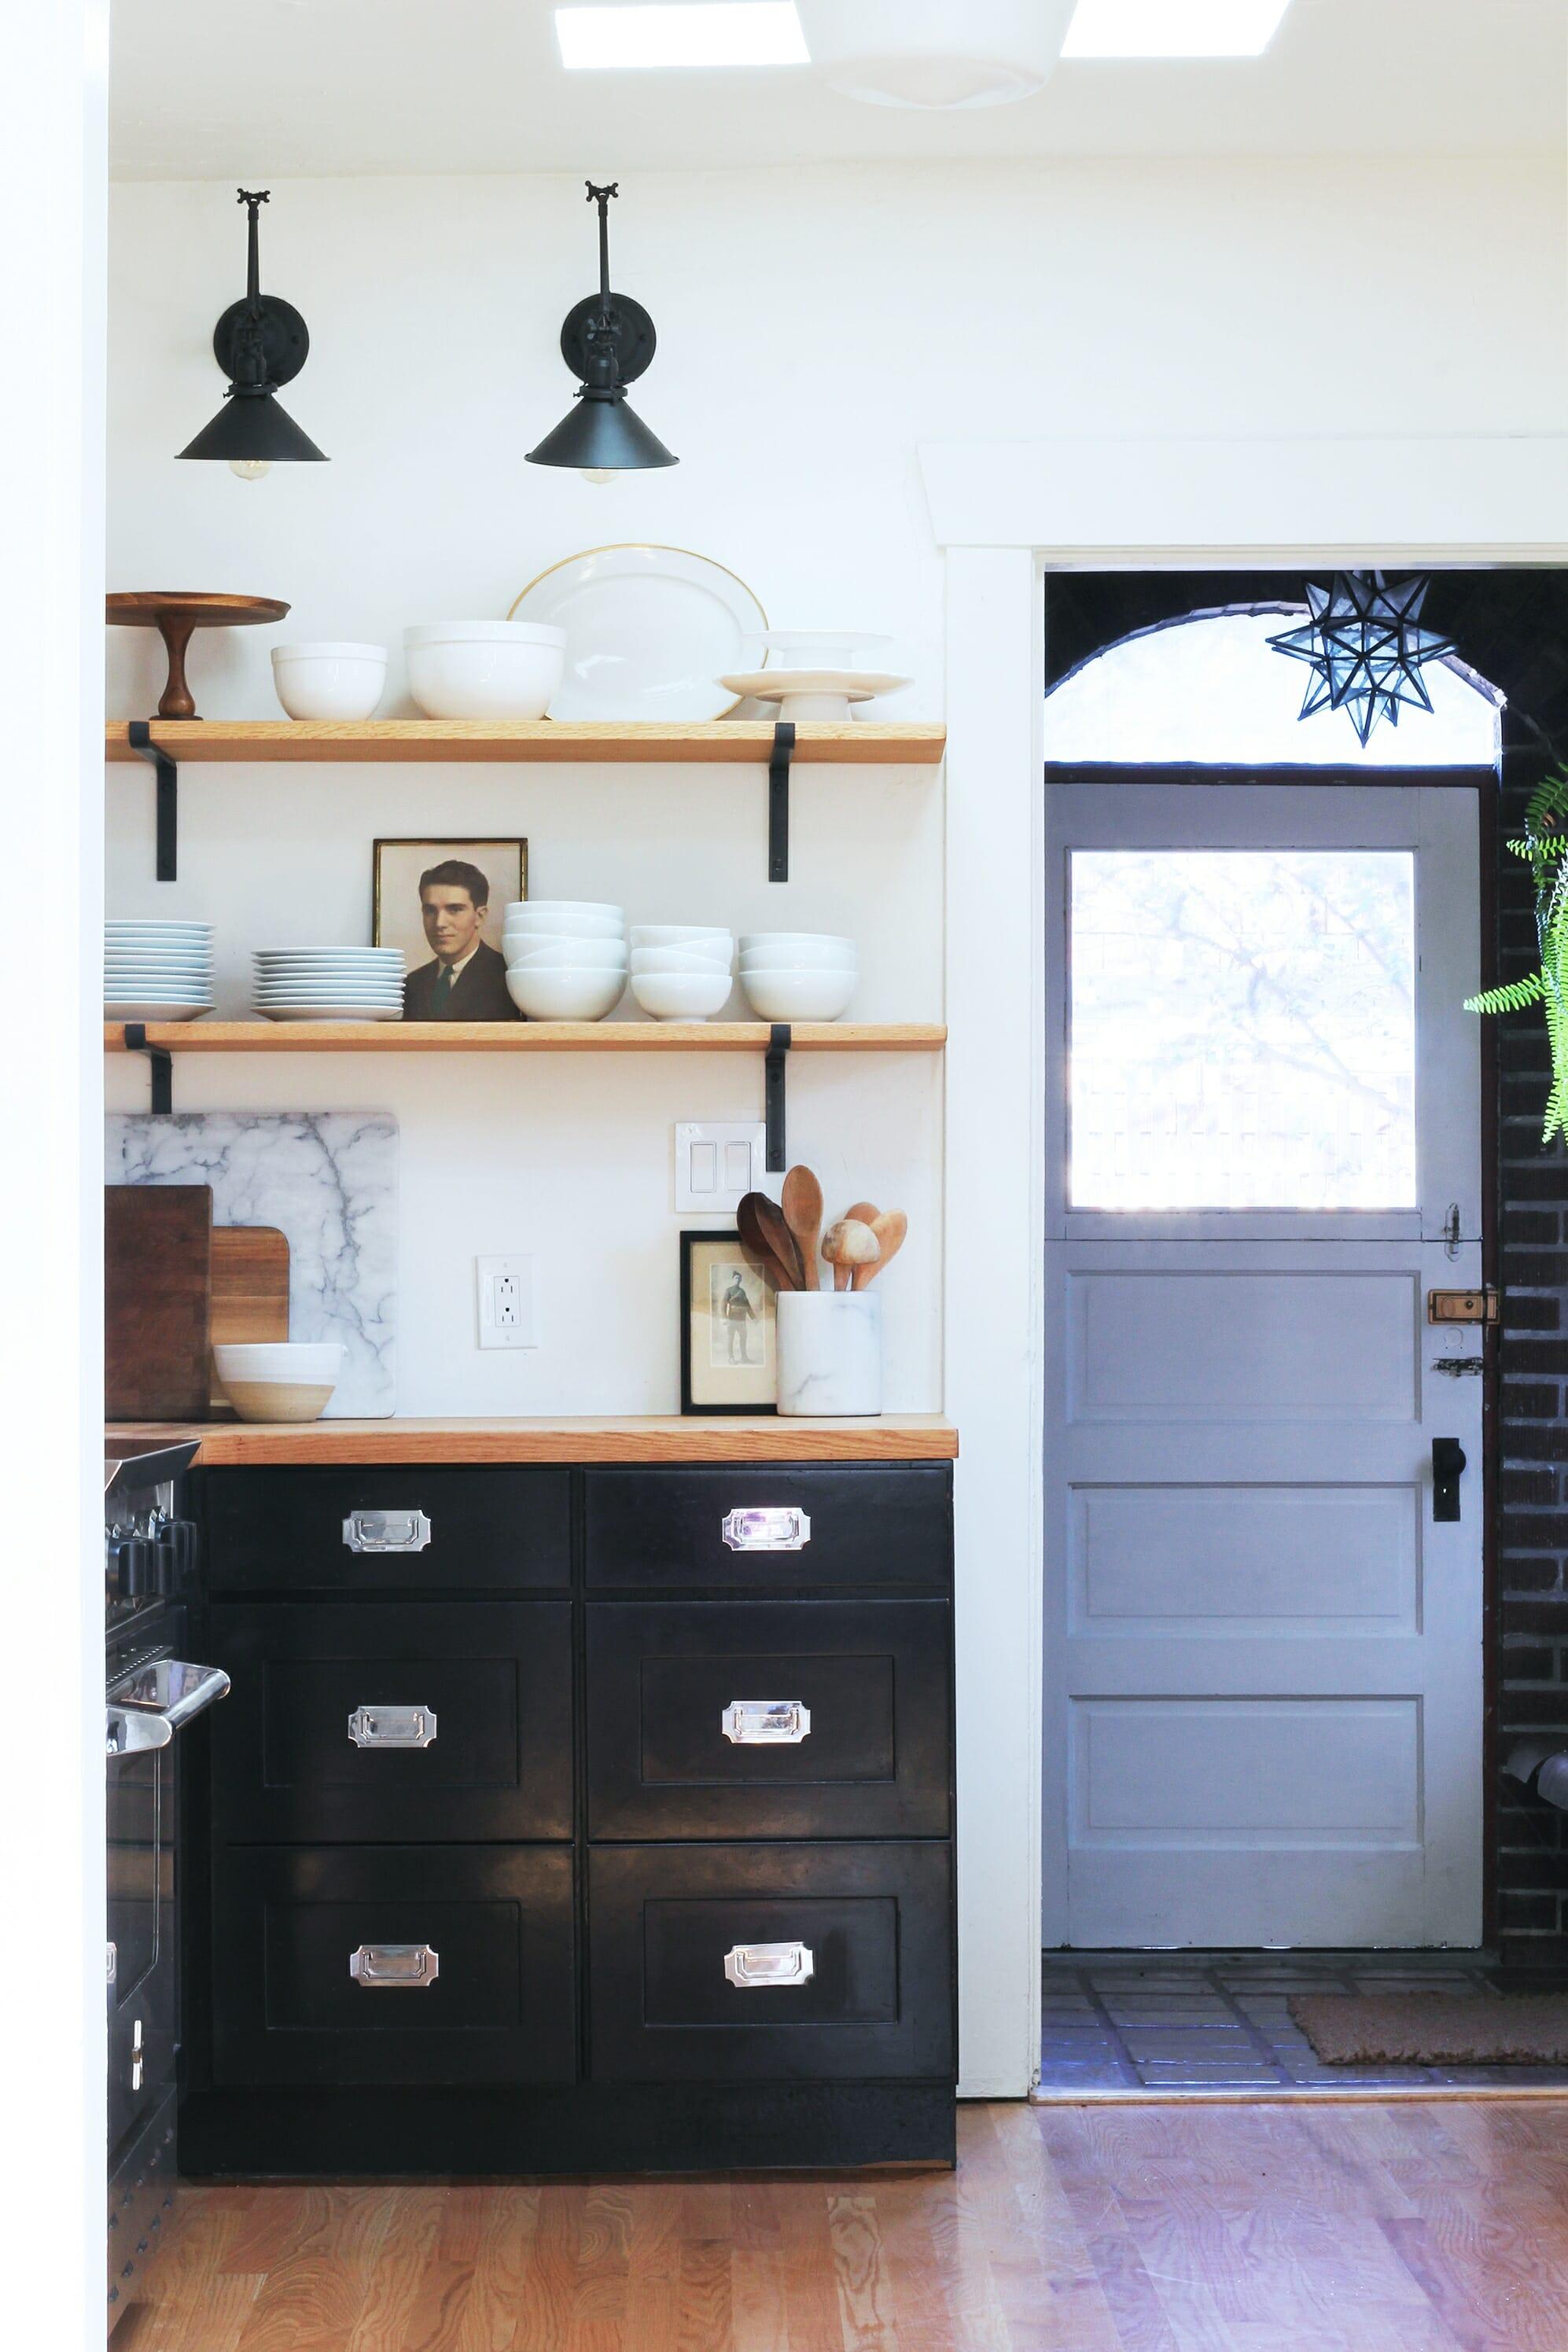 dexter kitchen danze parma faucet the grit and polish back door 1 2 beginning